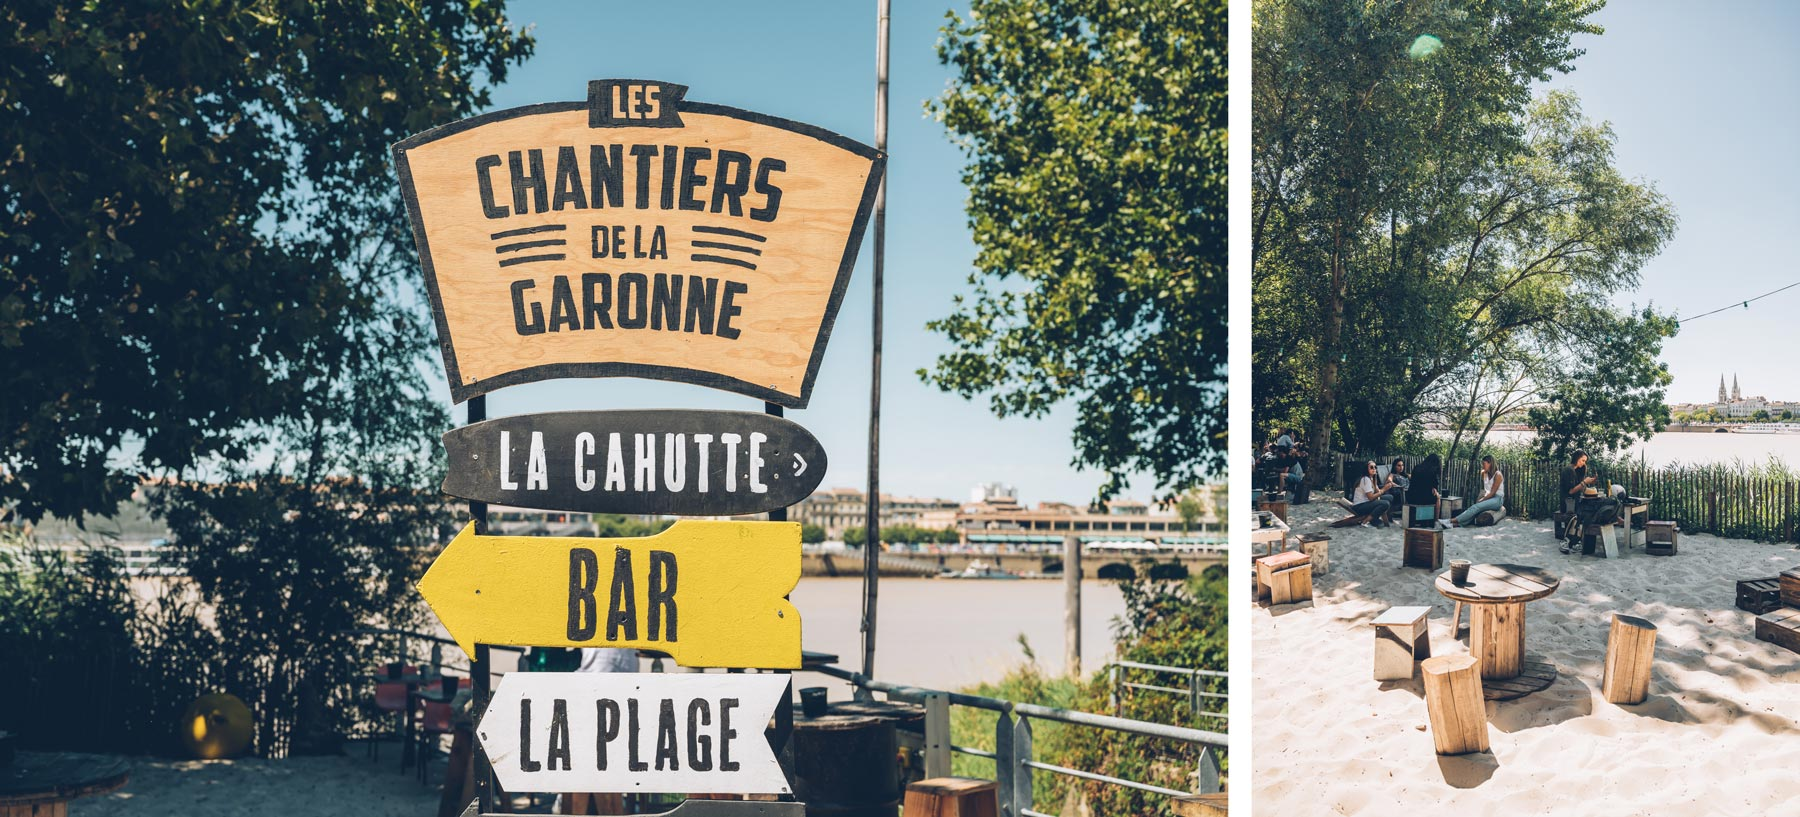 Chantiers de la Garonne, Bordeaux